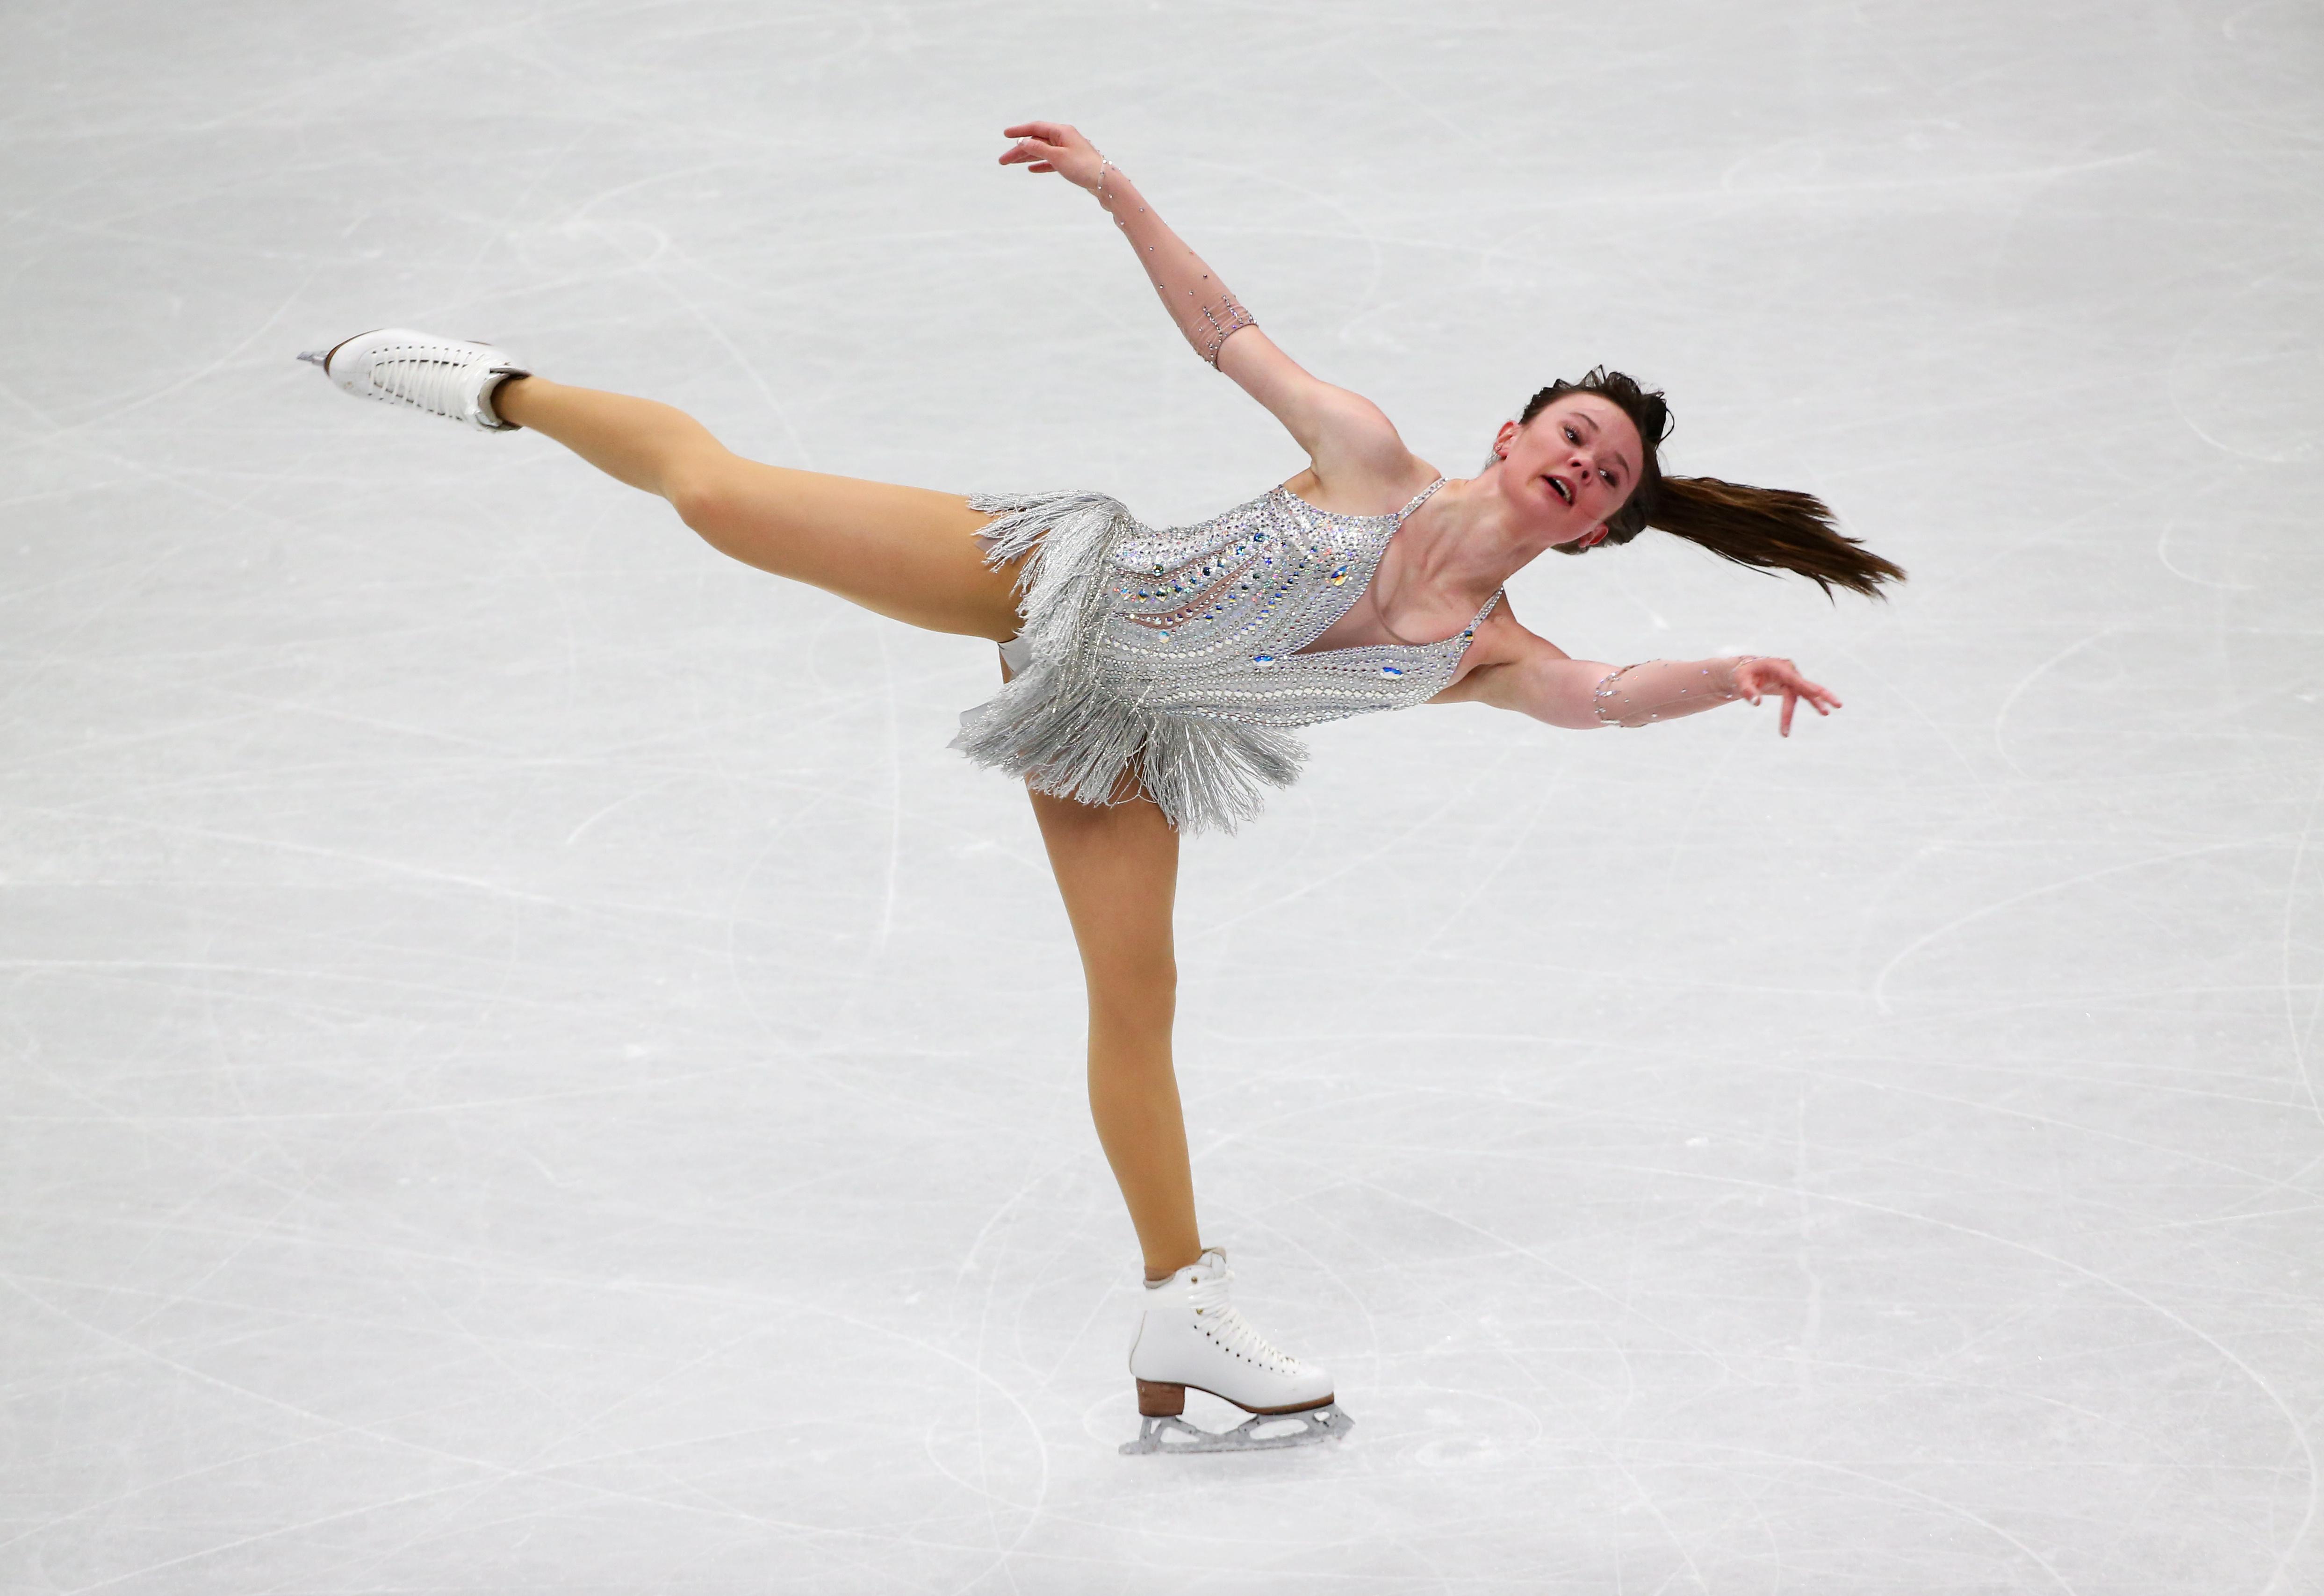 Figure Skating—World Figure Skating Championships